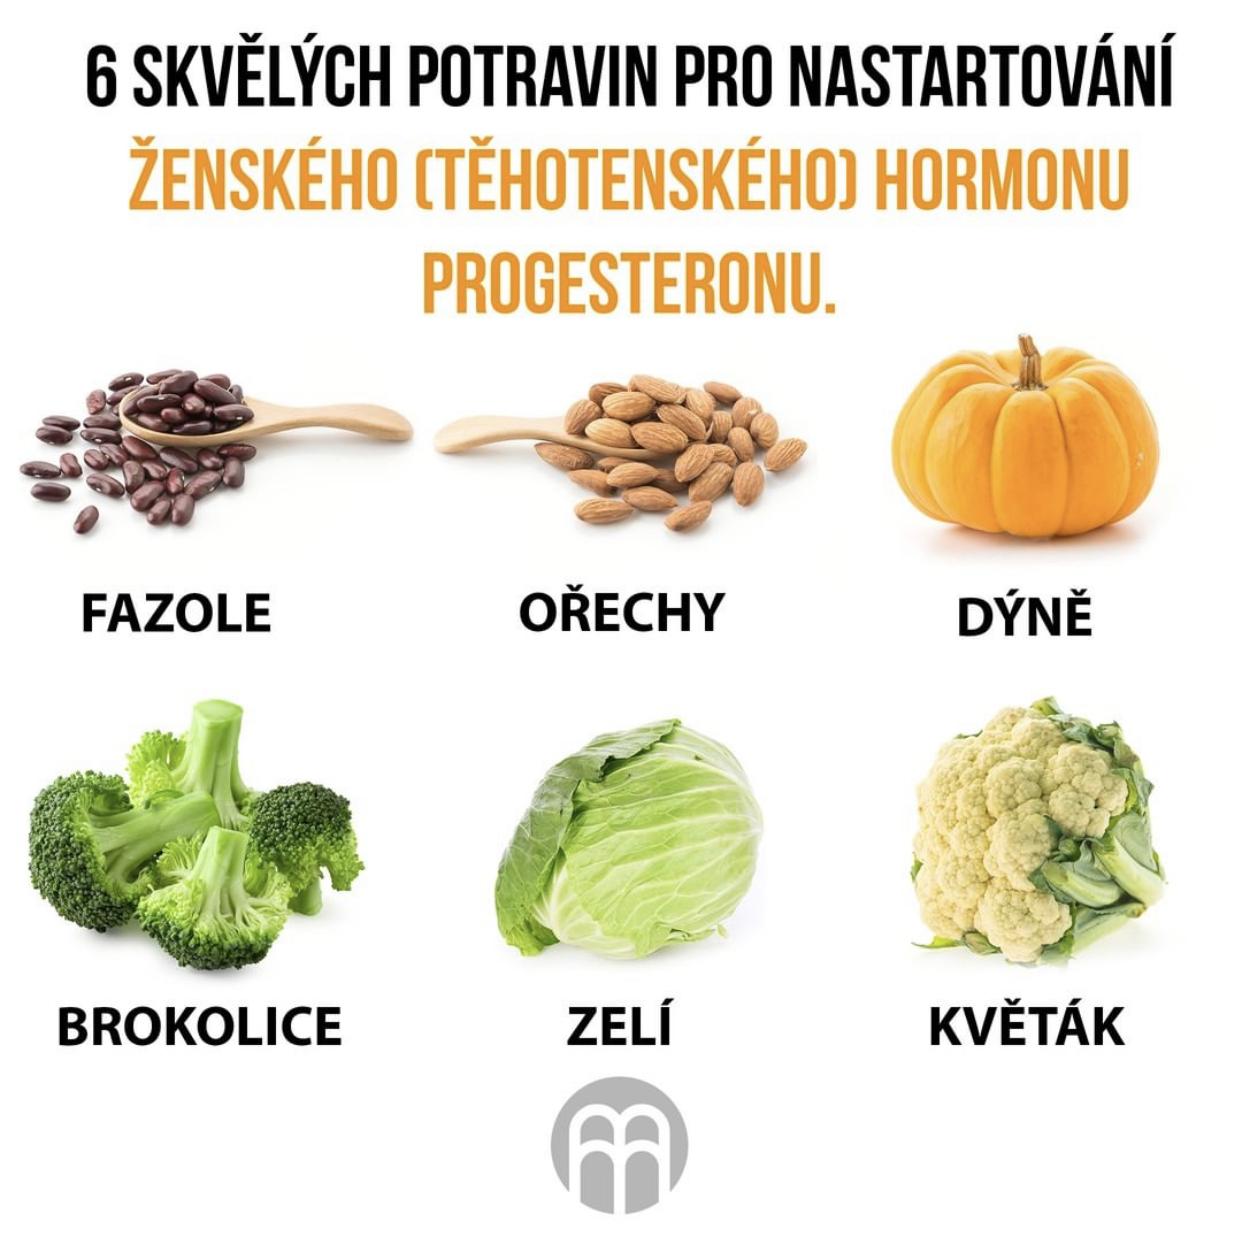 Progesteron-potraviny